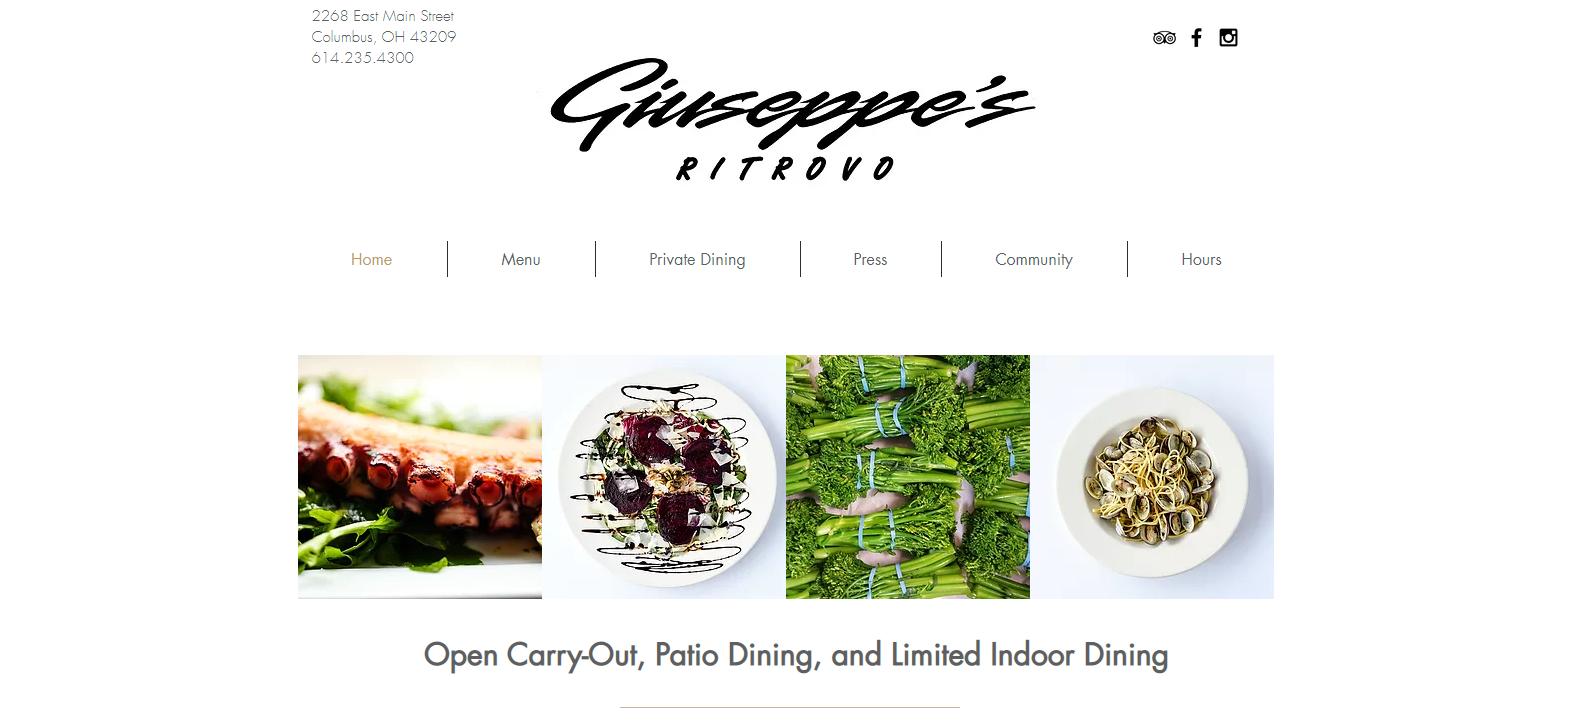 5 Italian Restaurants in Columbus